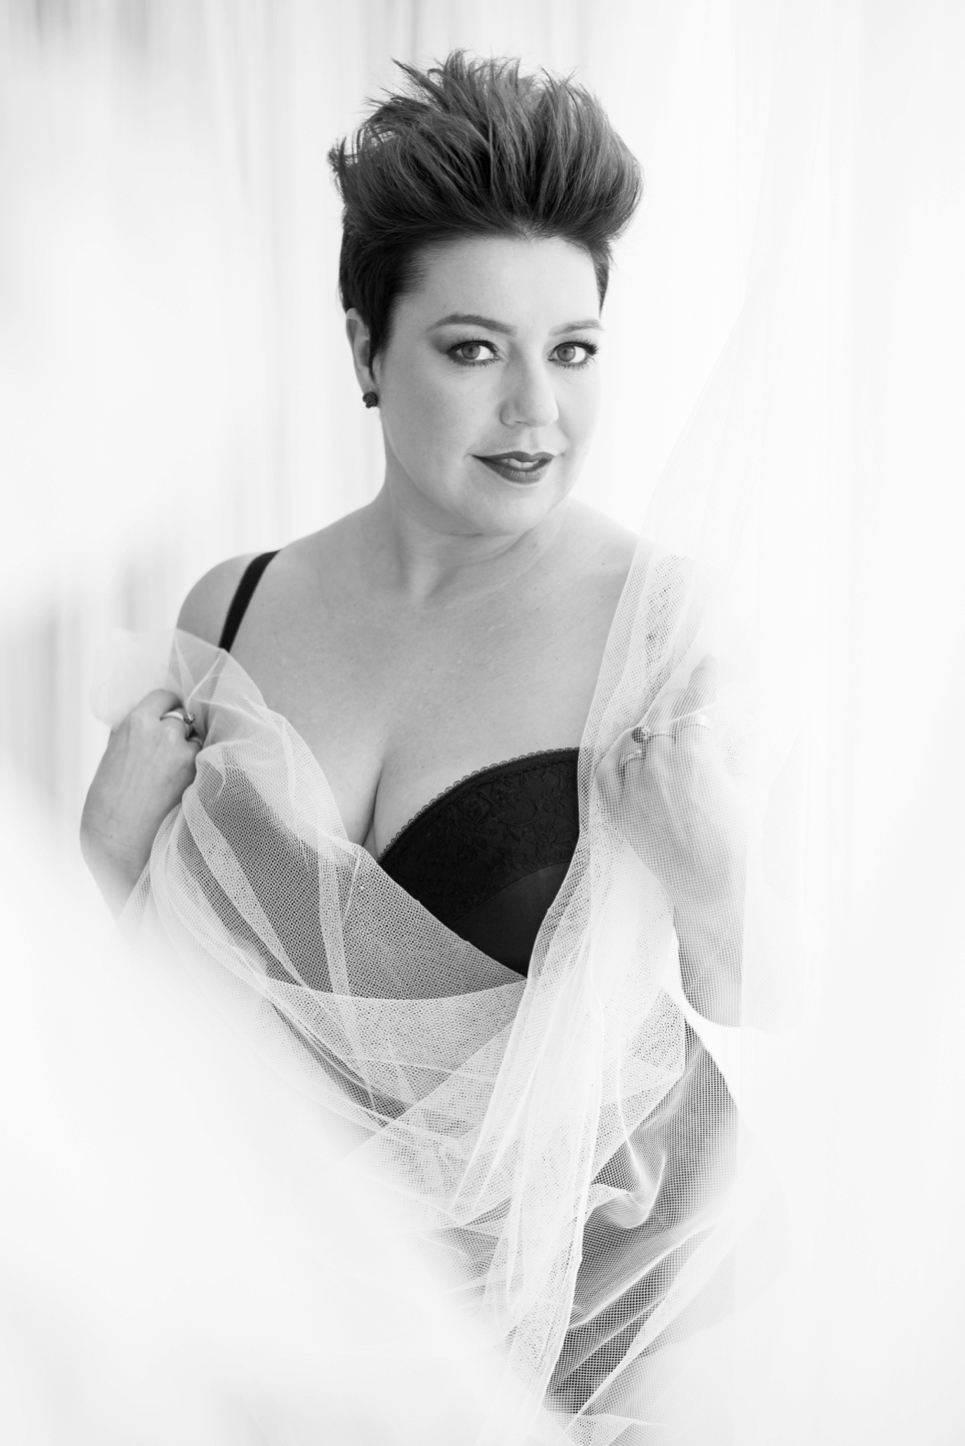 boudoir-fotoshoot-in-lingerie-romantisch-sexy